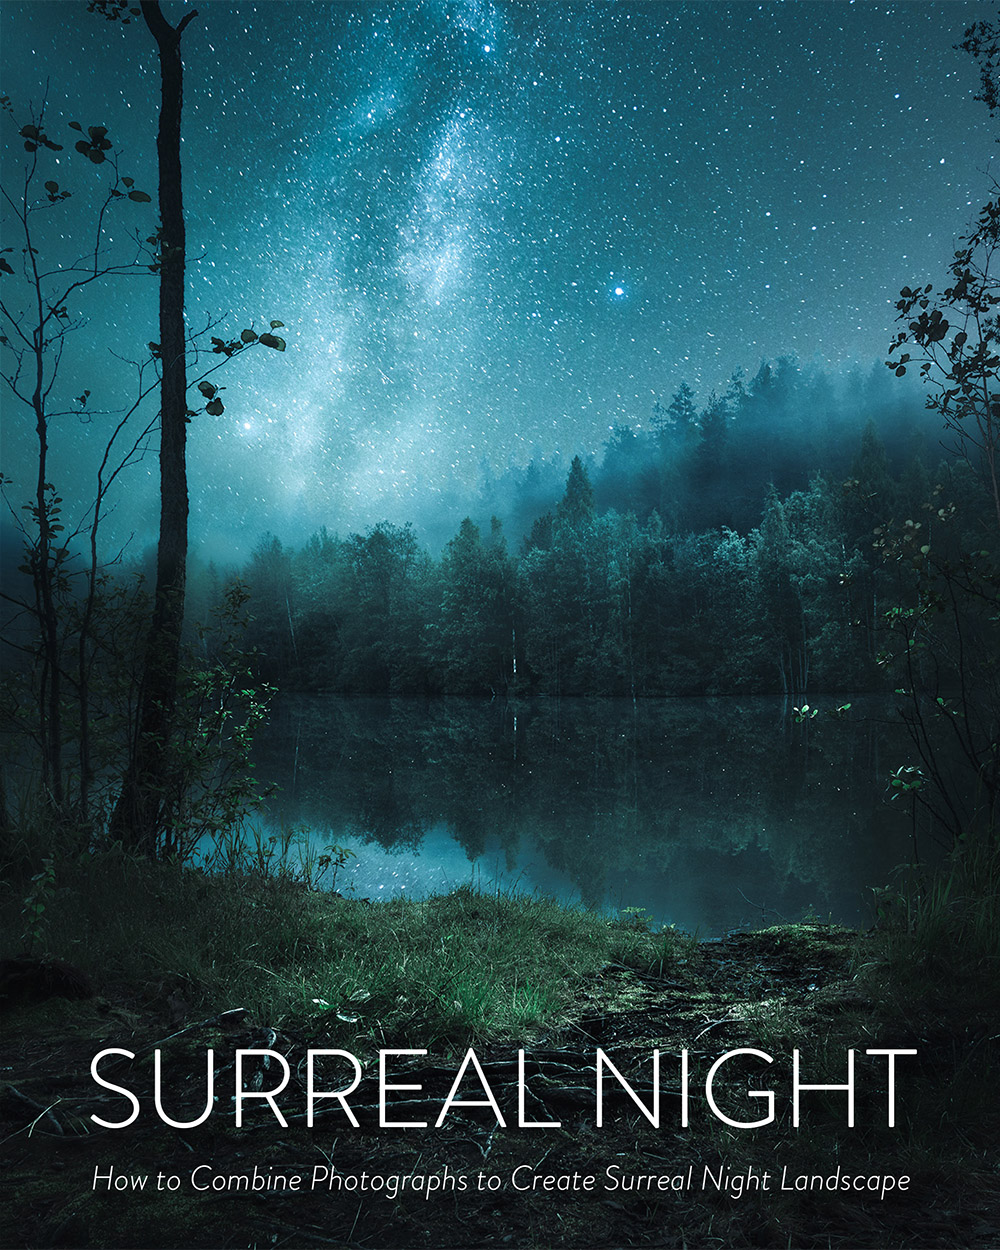 Surreal-Night-edit-1.jpg